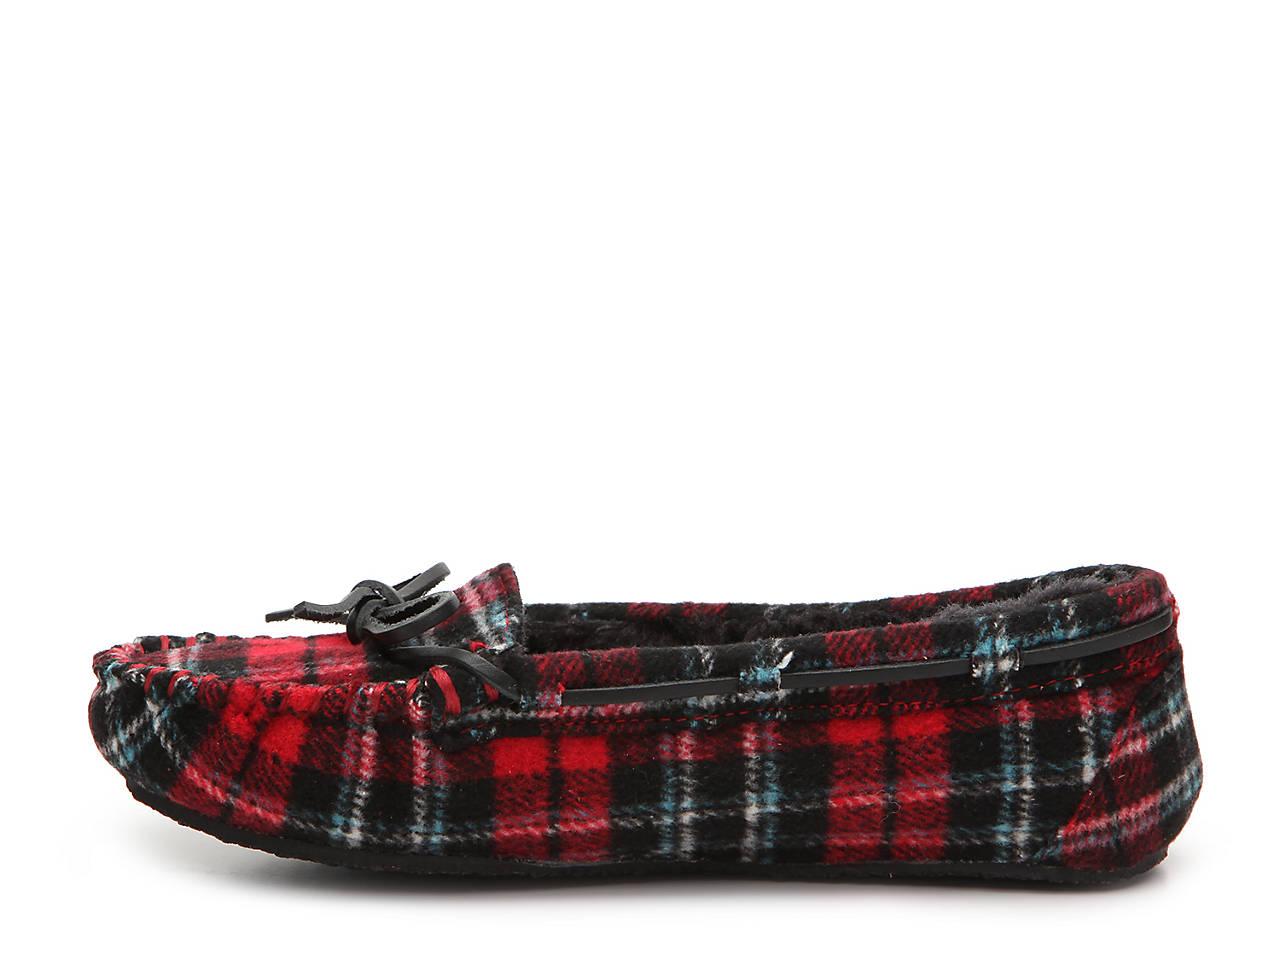 b8dfb3314b3 Minnetonka Plaid Cally Slipper Women s Shoes